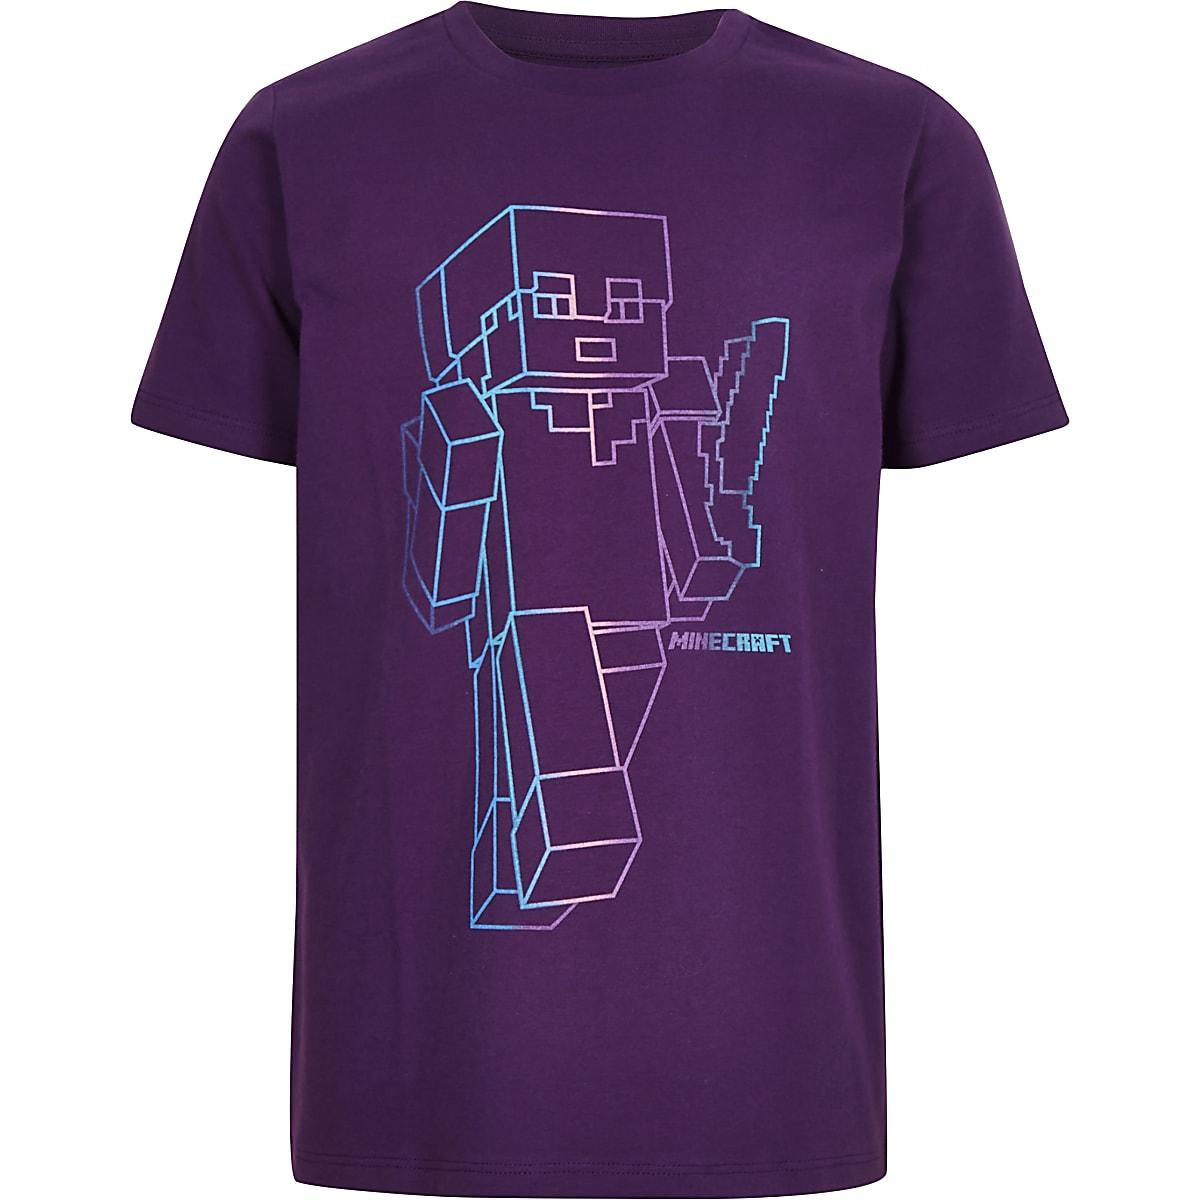 920c66e17 Boys purple Minecraft T-shirt - T-shirts - T-Shirts & Vests - boys